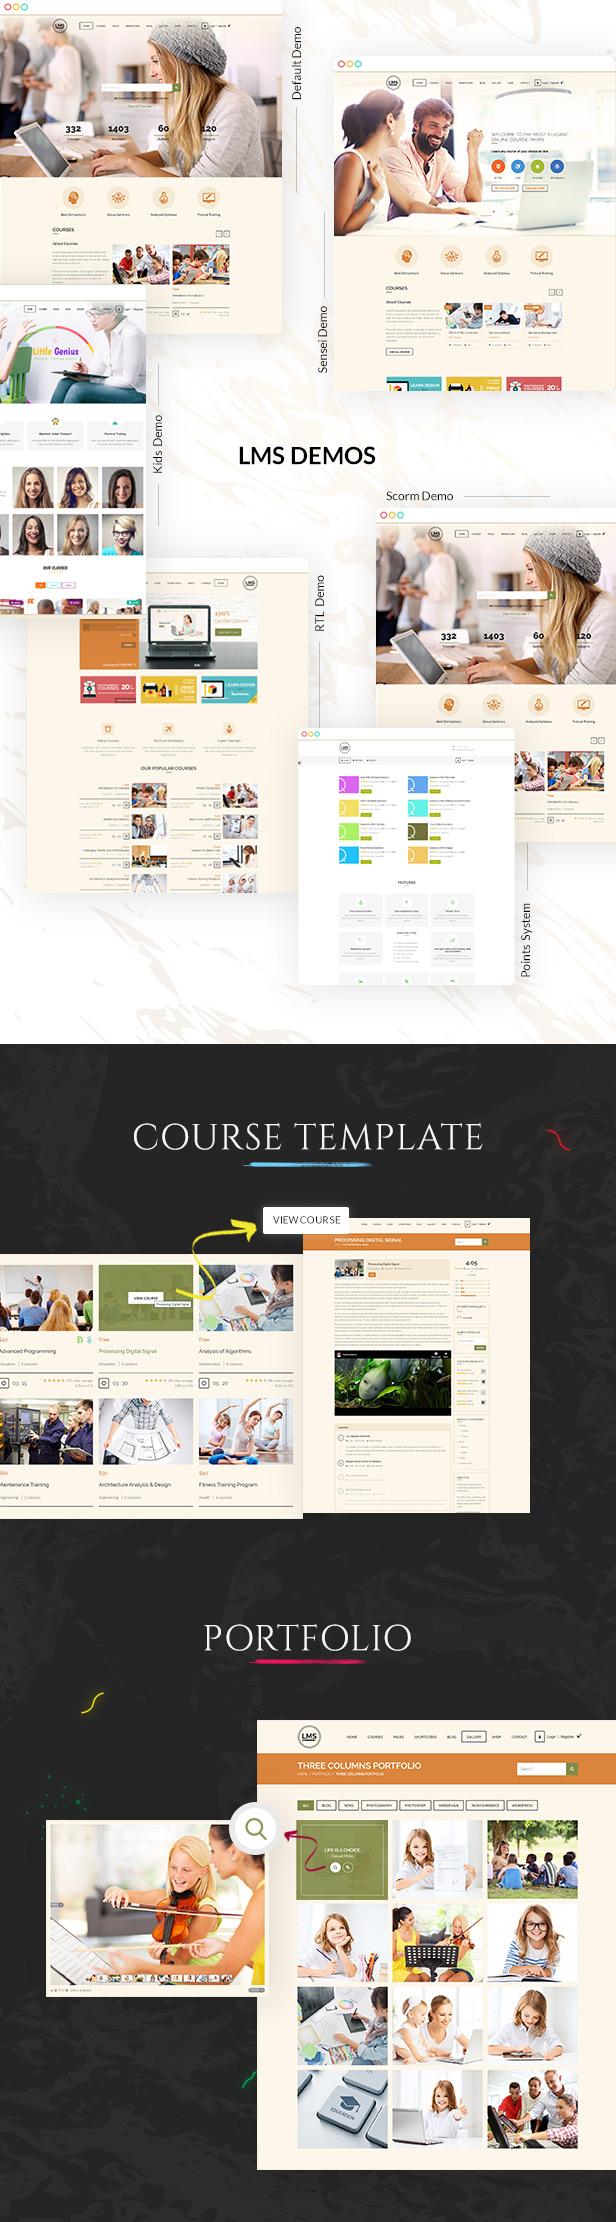 LMS Education WordPress Theme - 3